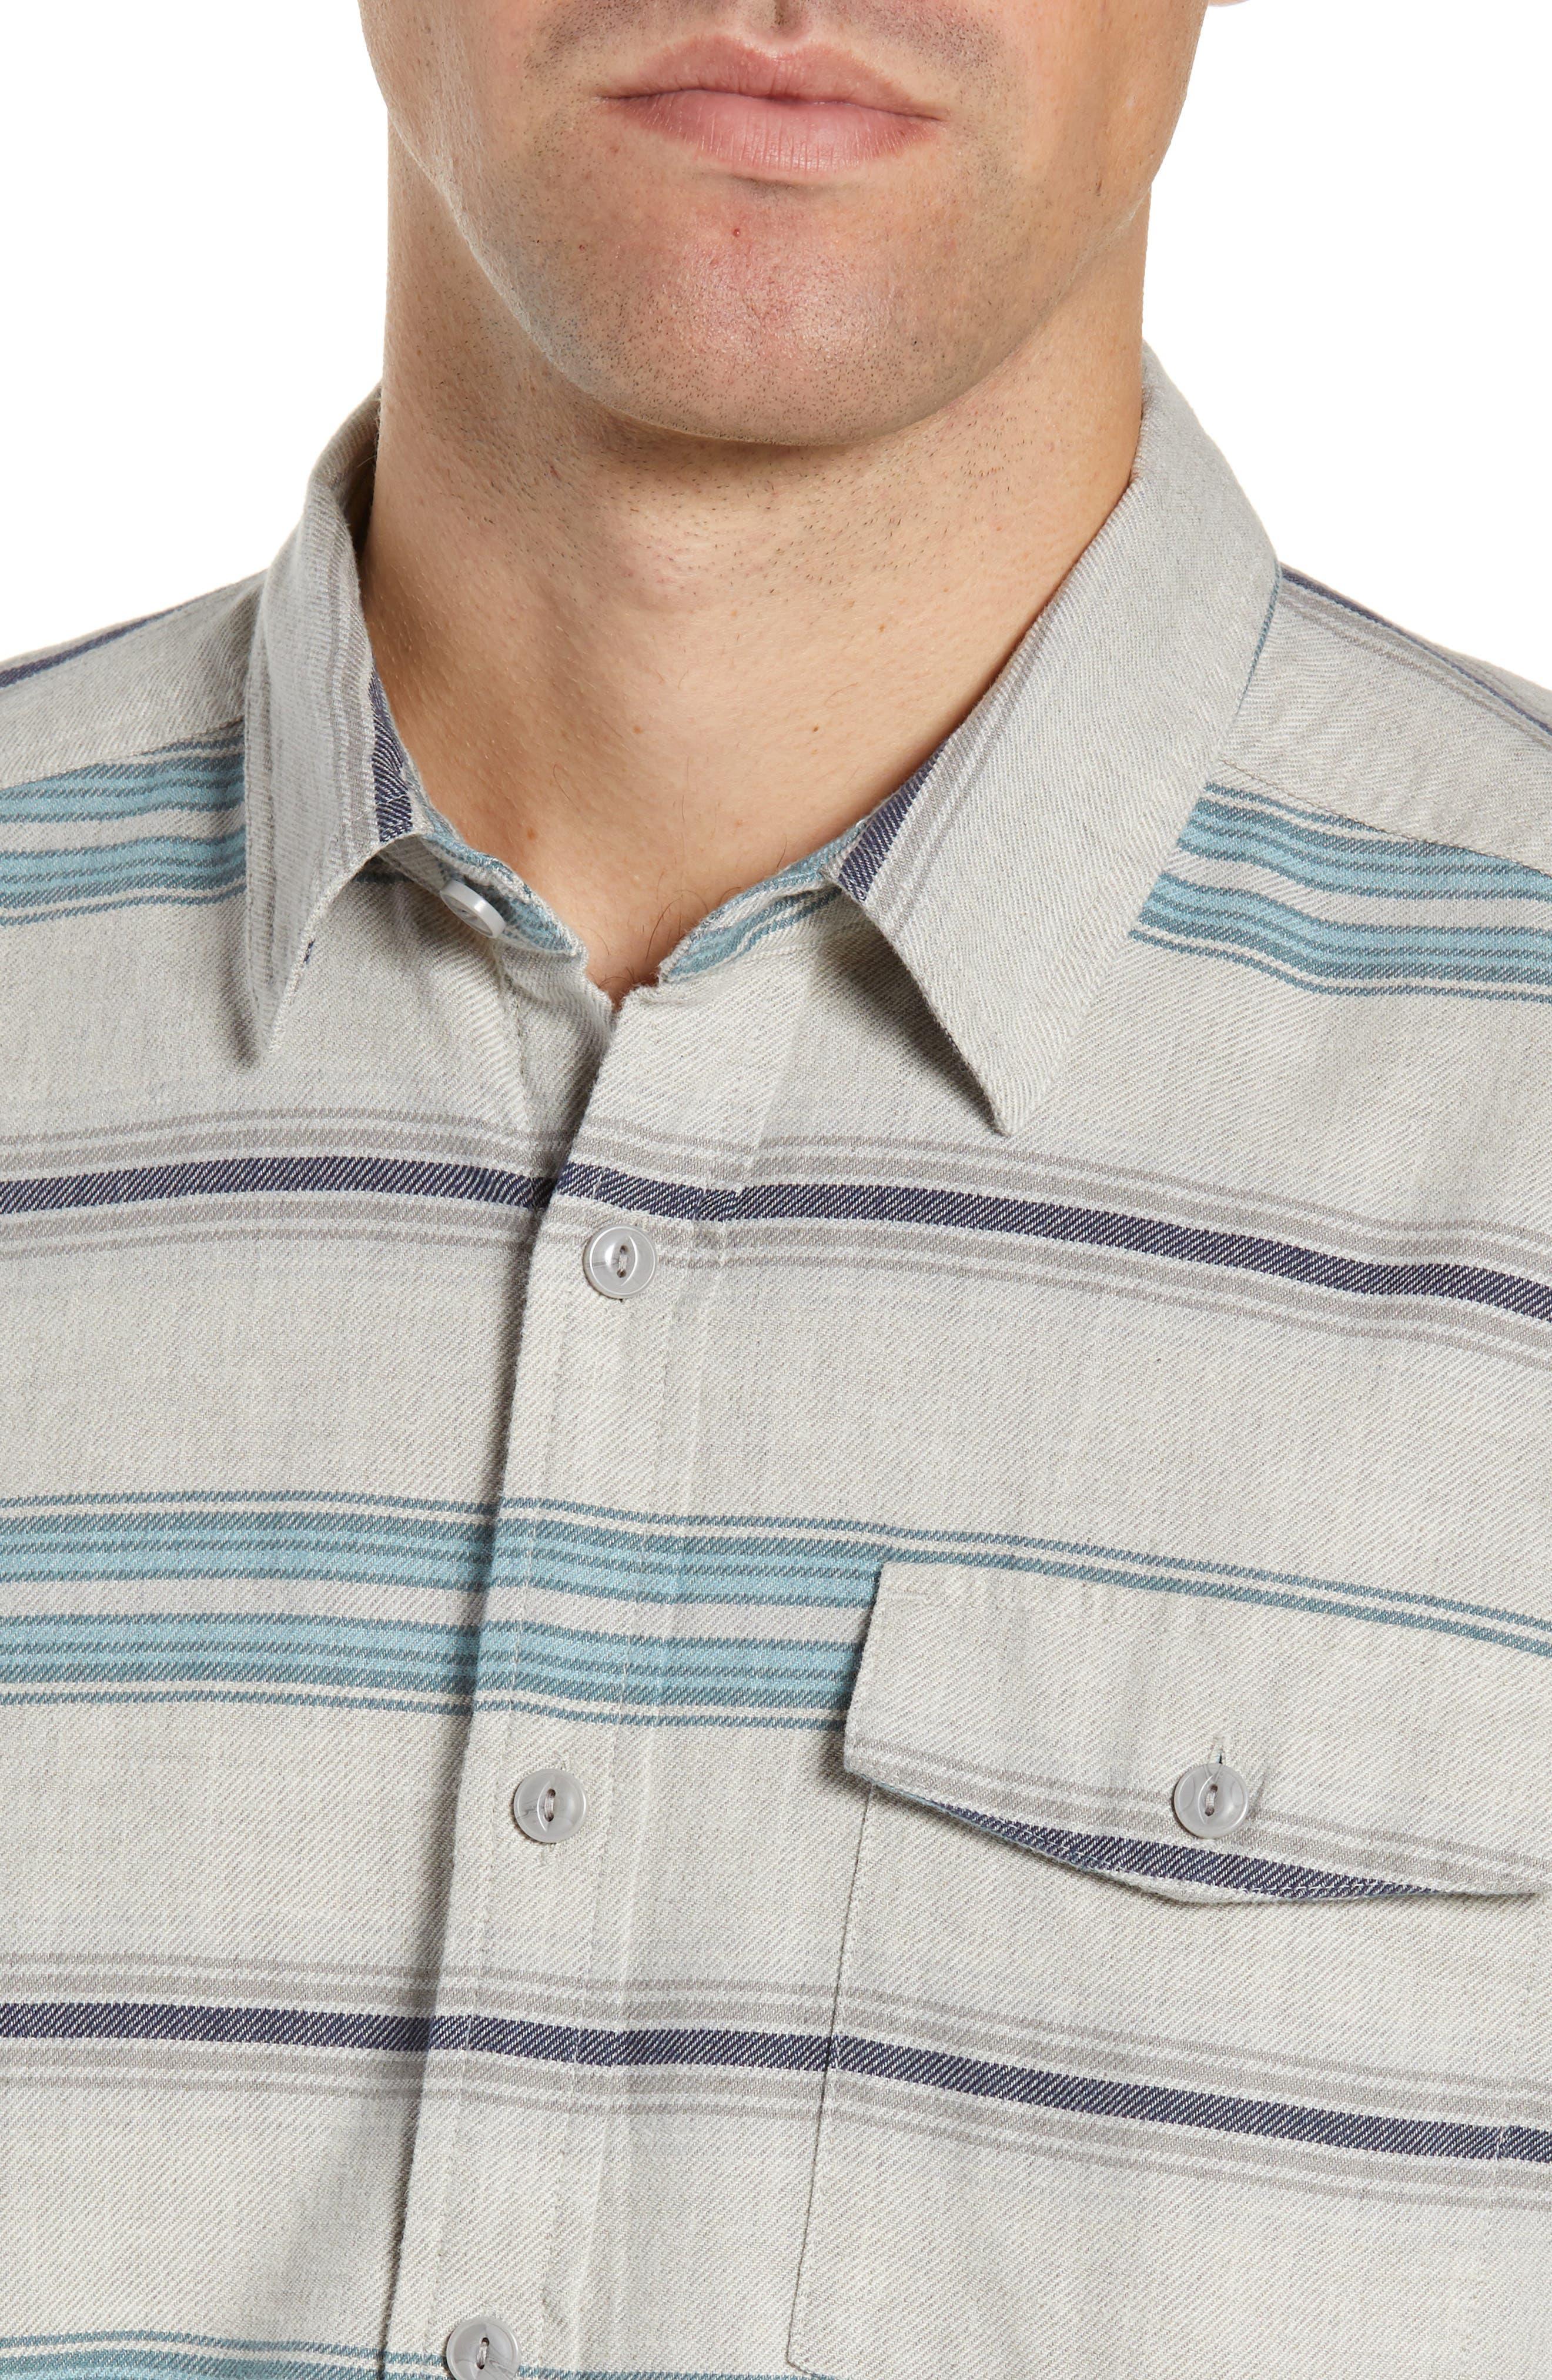 PATAGONIA,                             Regular Fit Organic Cotton Flannel Shirt,                             Alternate thumbnail 2, color,                             TARKINE STRIPE DRIFTER GREY